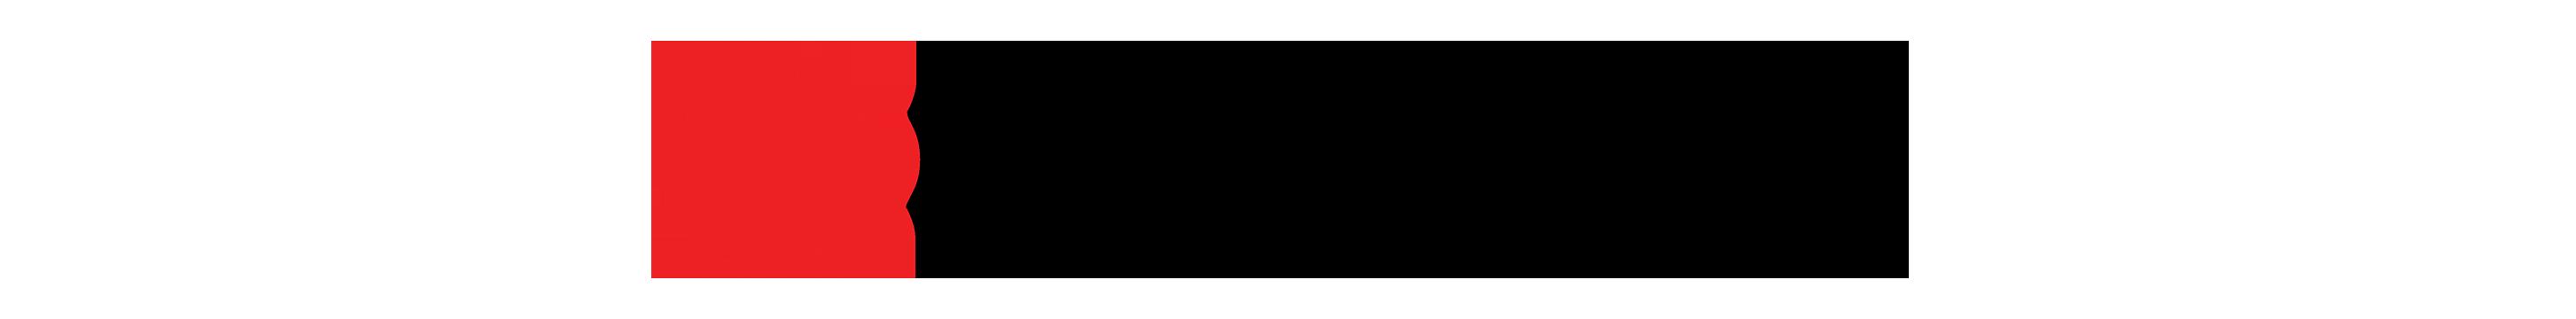 https://yulcom-technologies.com/wp-content/uploads/2021/06/radio-canada-logo-2.png